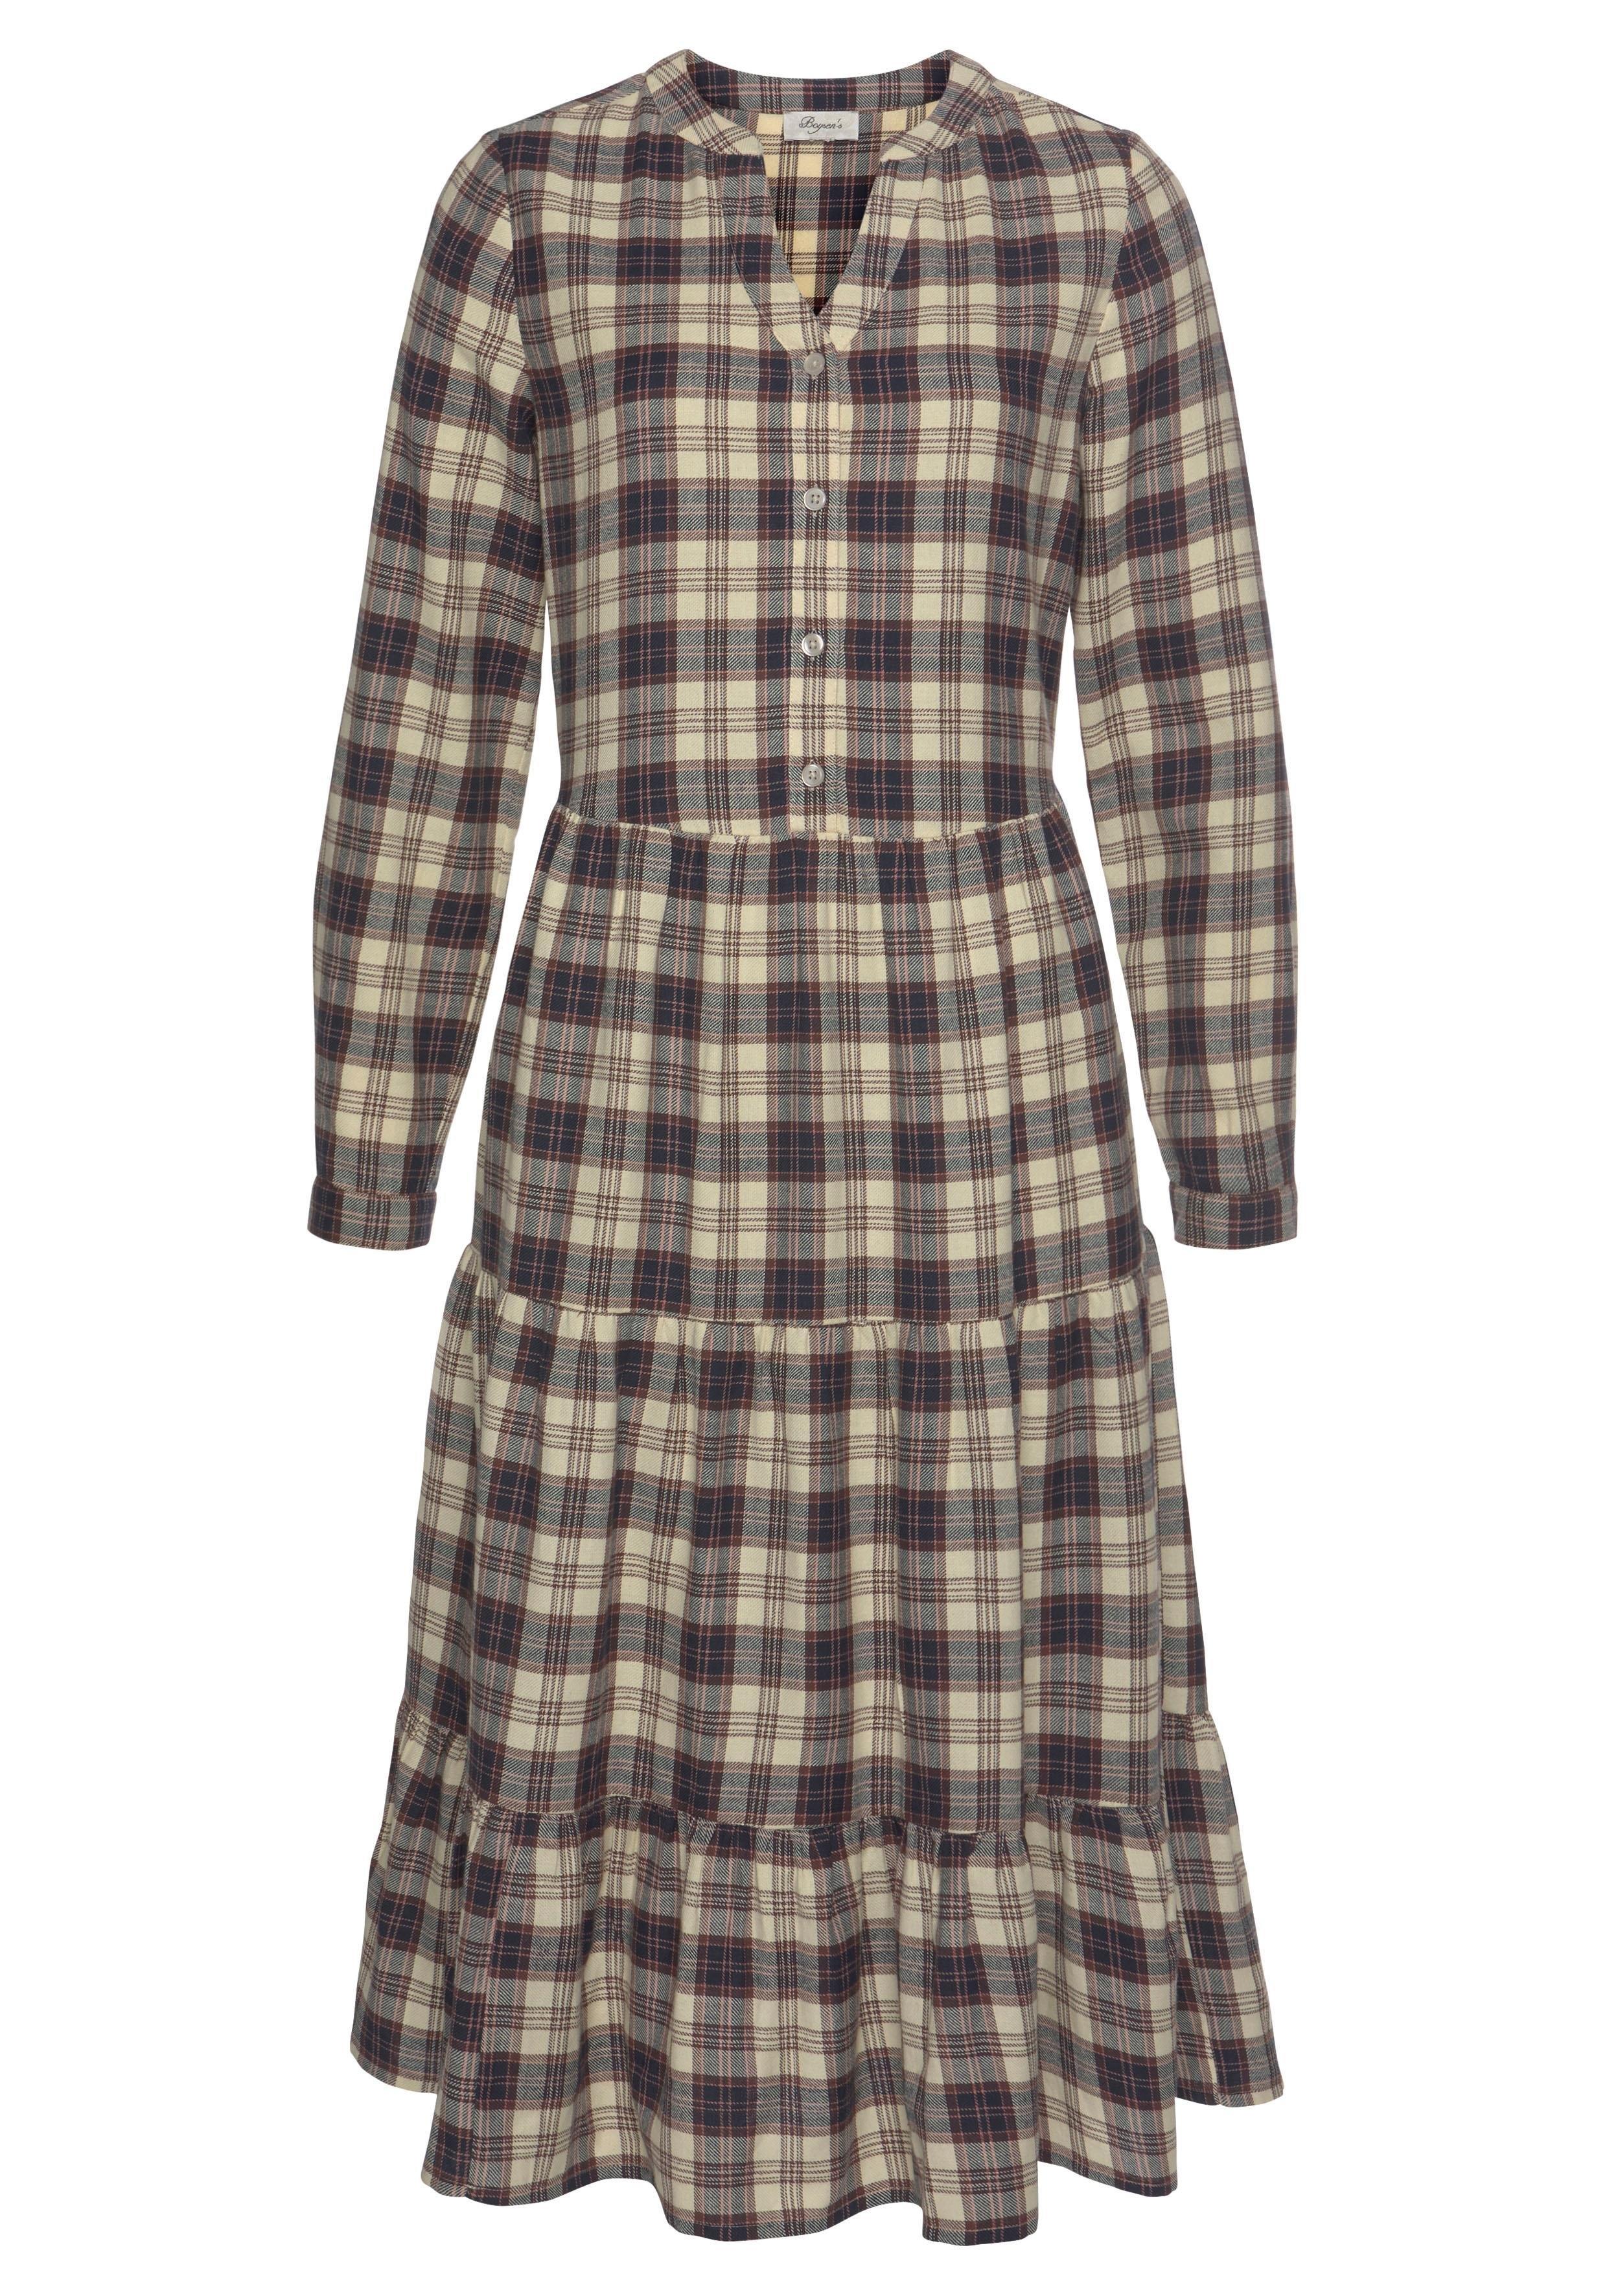 BOYSEN'S geruite jurk online kopen op otto.nl